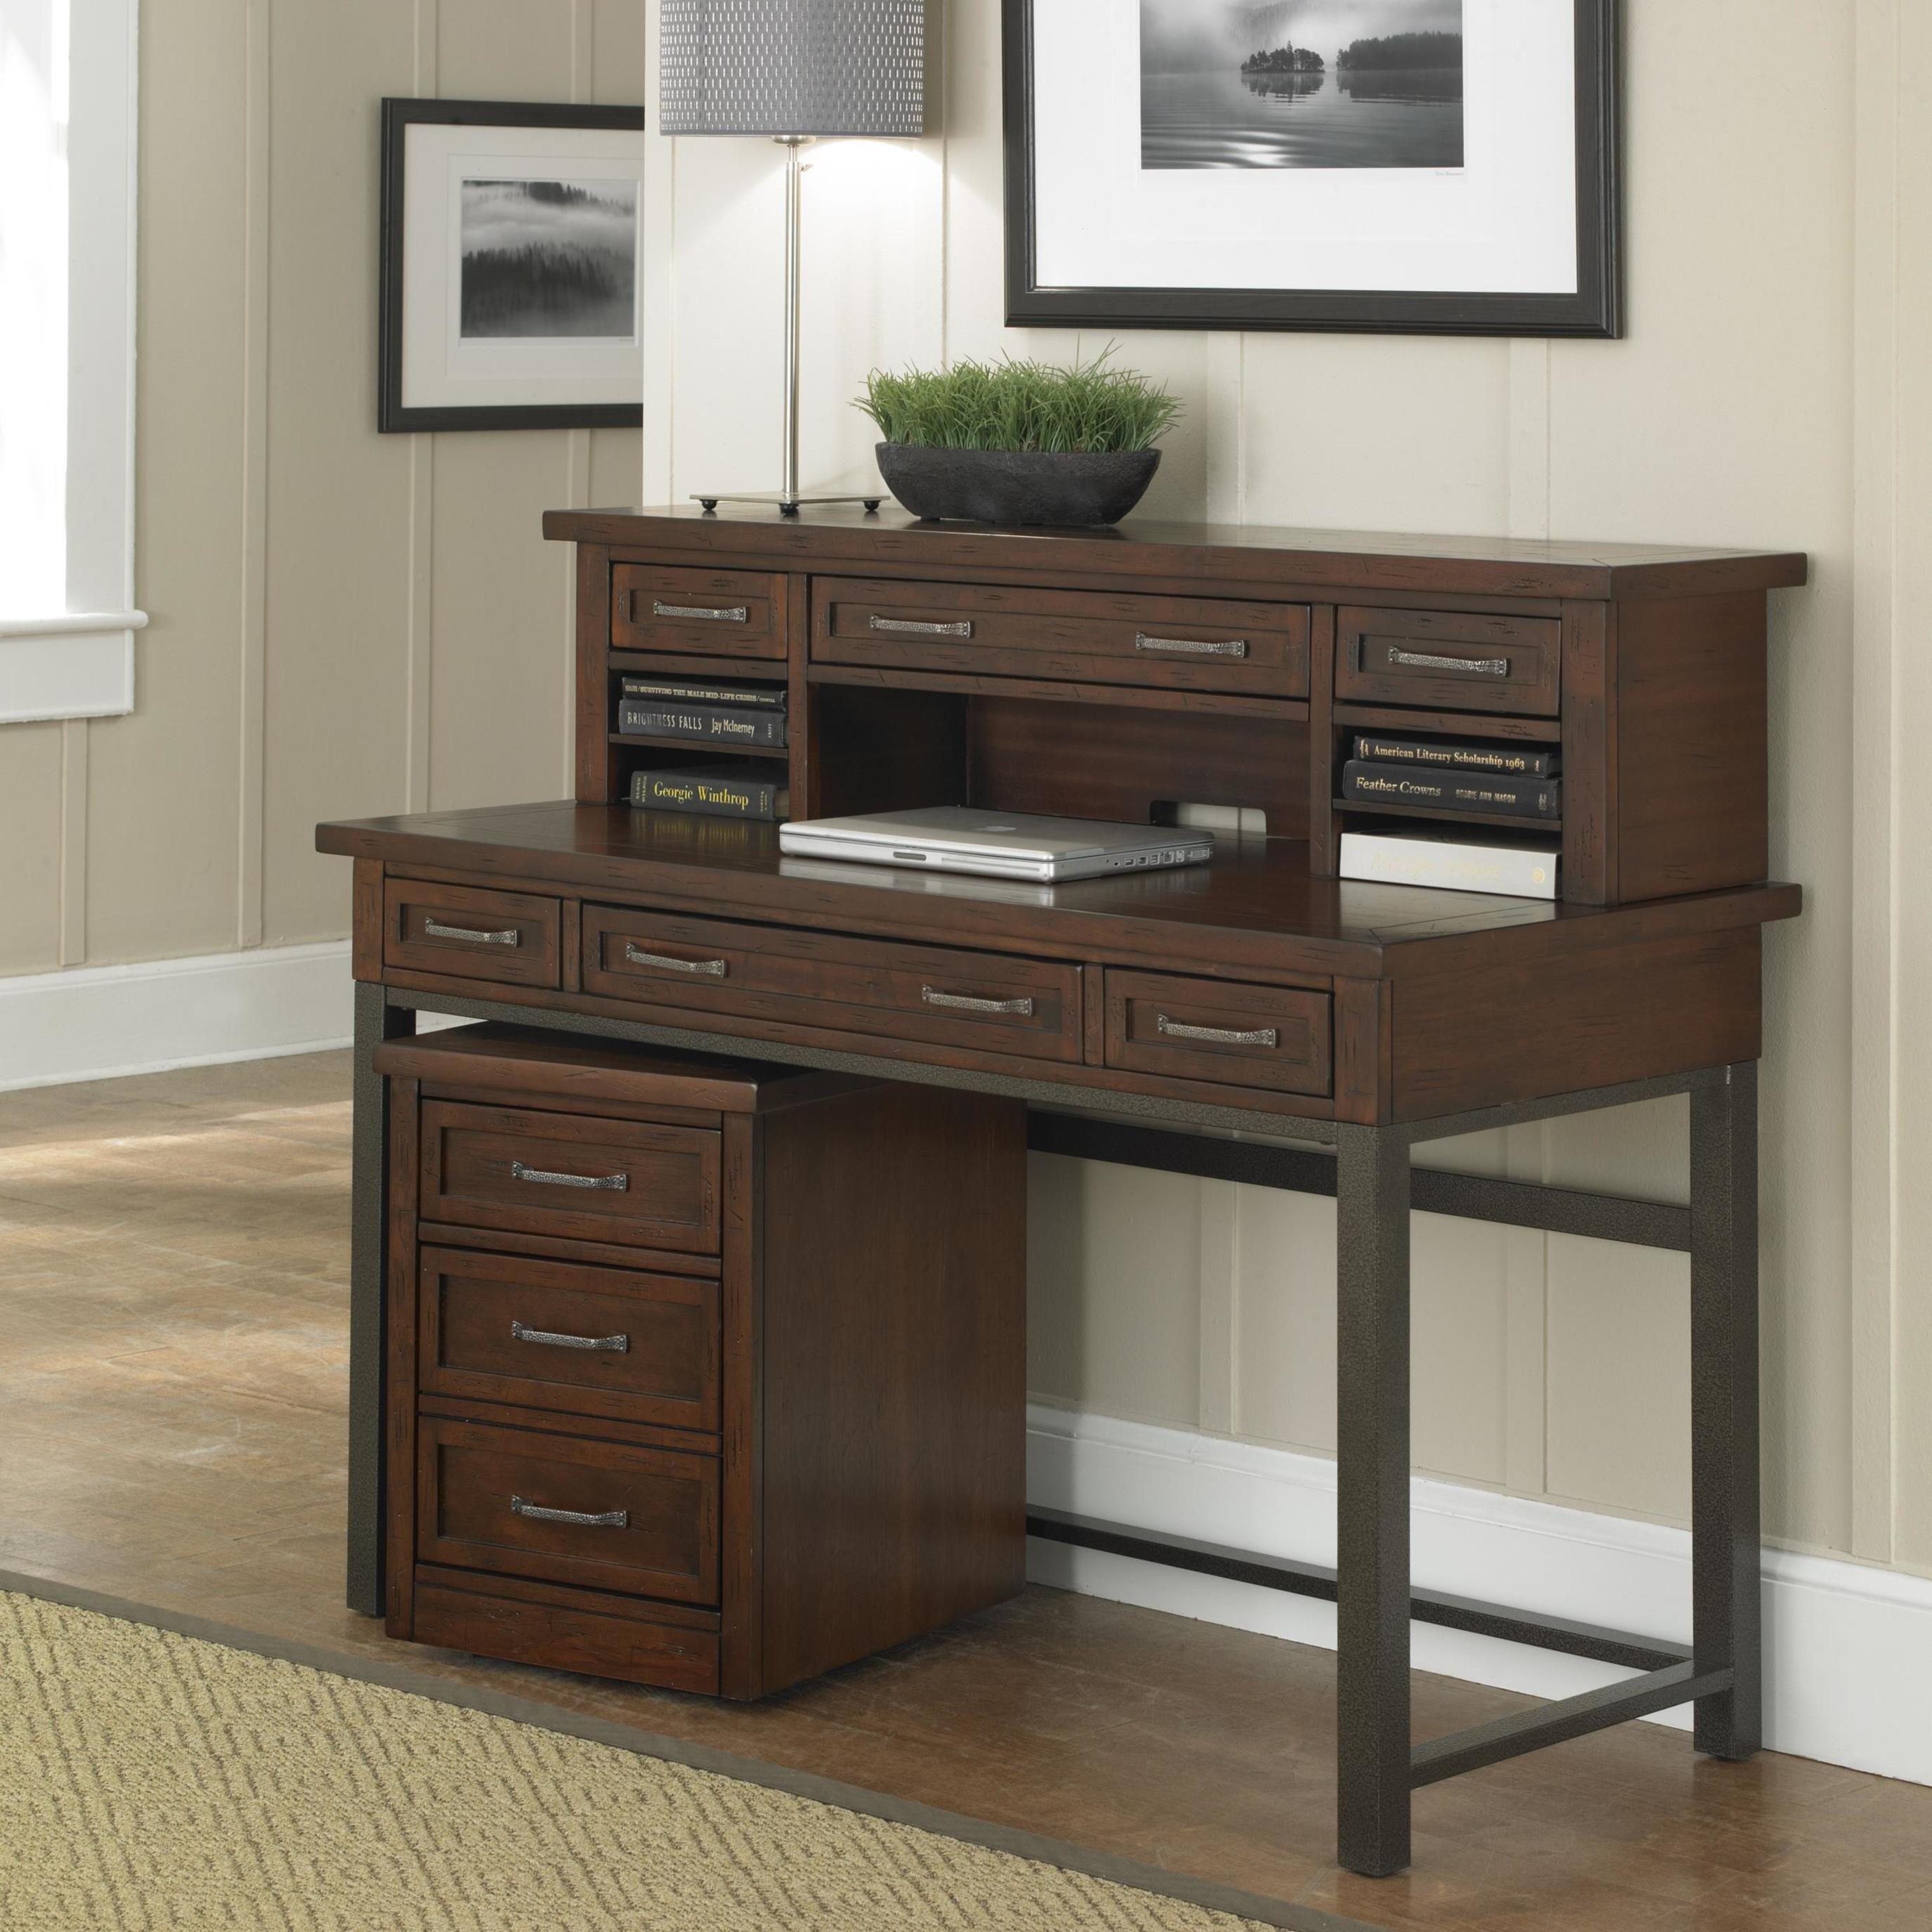 Small Black Computer Desk Design For Workspace And Home Office Area Home Office Desks S Desks For Small Spaces Home Office Furniture Sets Home Office Furniture